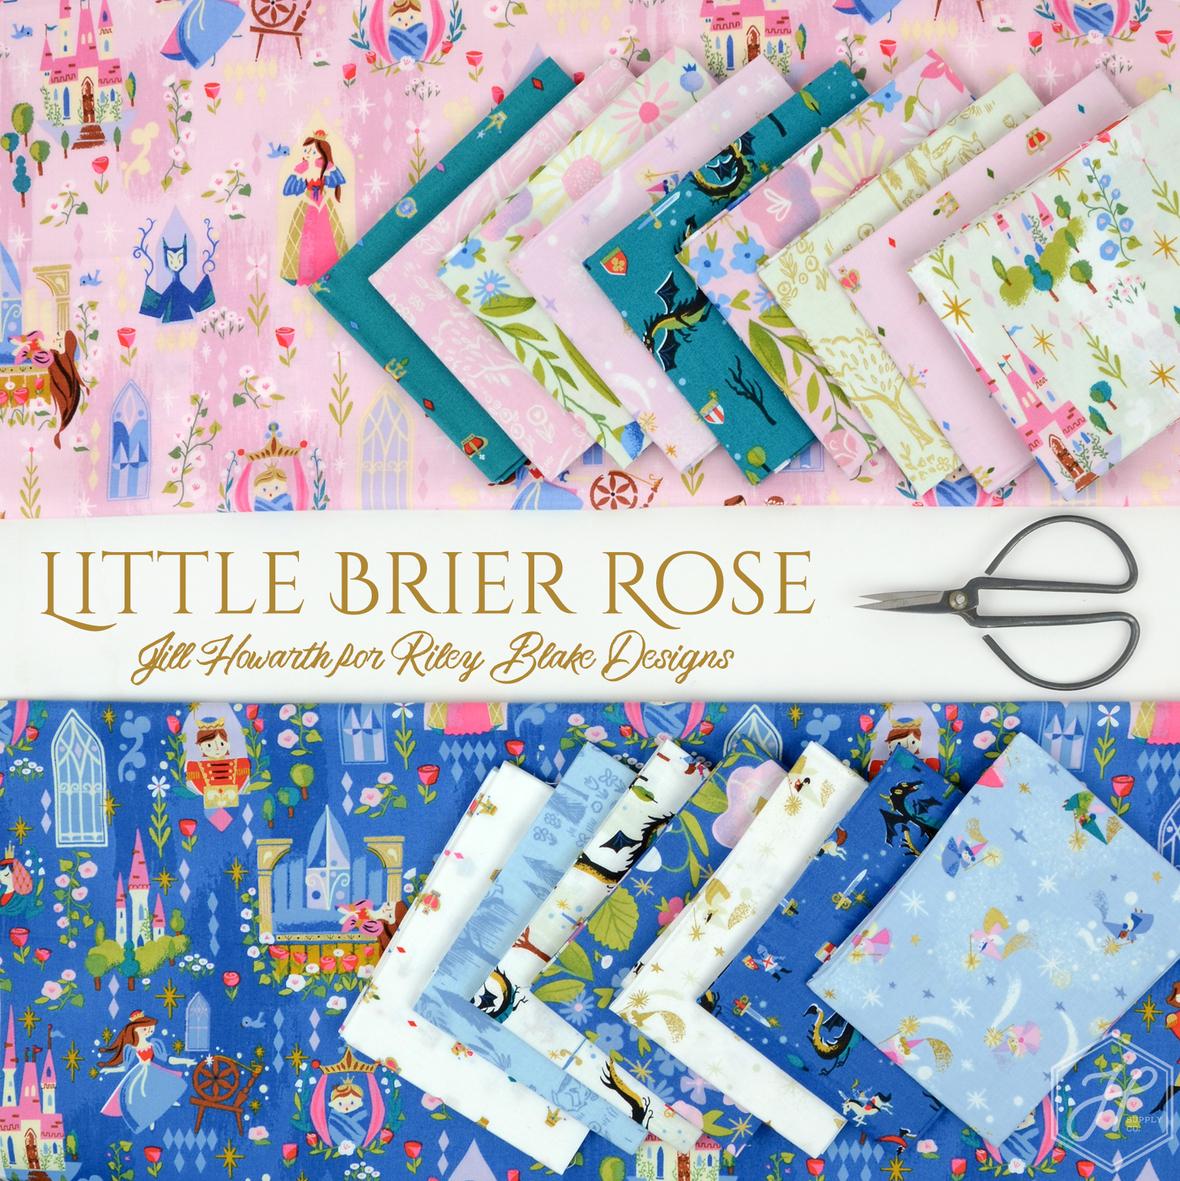 Little Brier Rose Jill Howarth for Riley Blake Designs at Hawthorne Supply Co